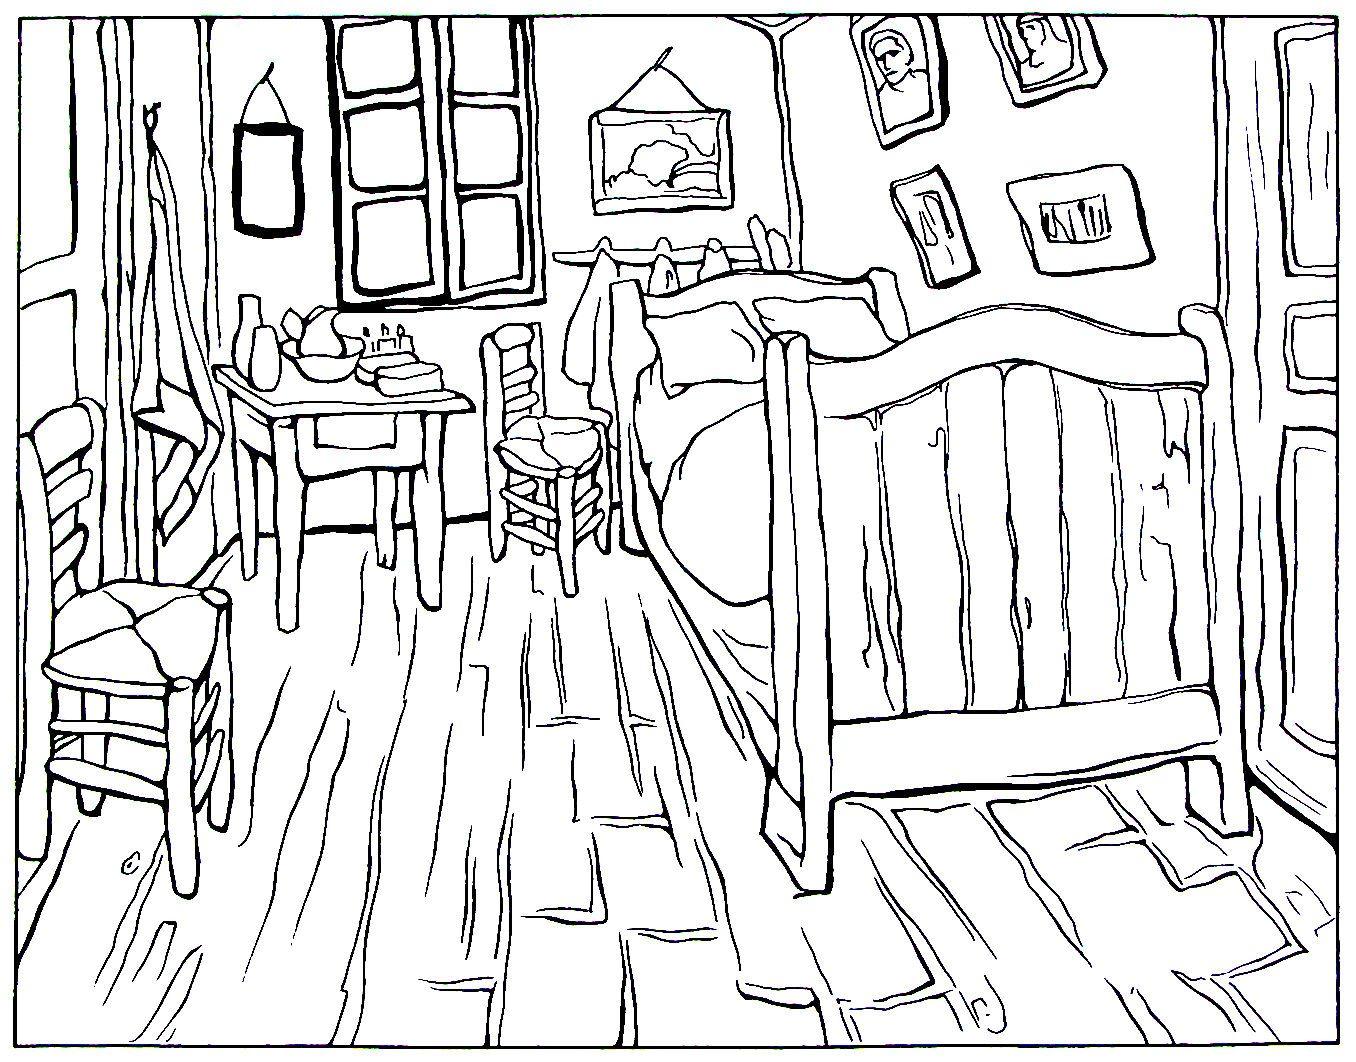 Van Gogh Bedroom Impressionist Painting By Vincent Van Gogh Printable Coloring Book Page Sanat Elestirisi Boyama Sayfalari Boyama Kitaplari